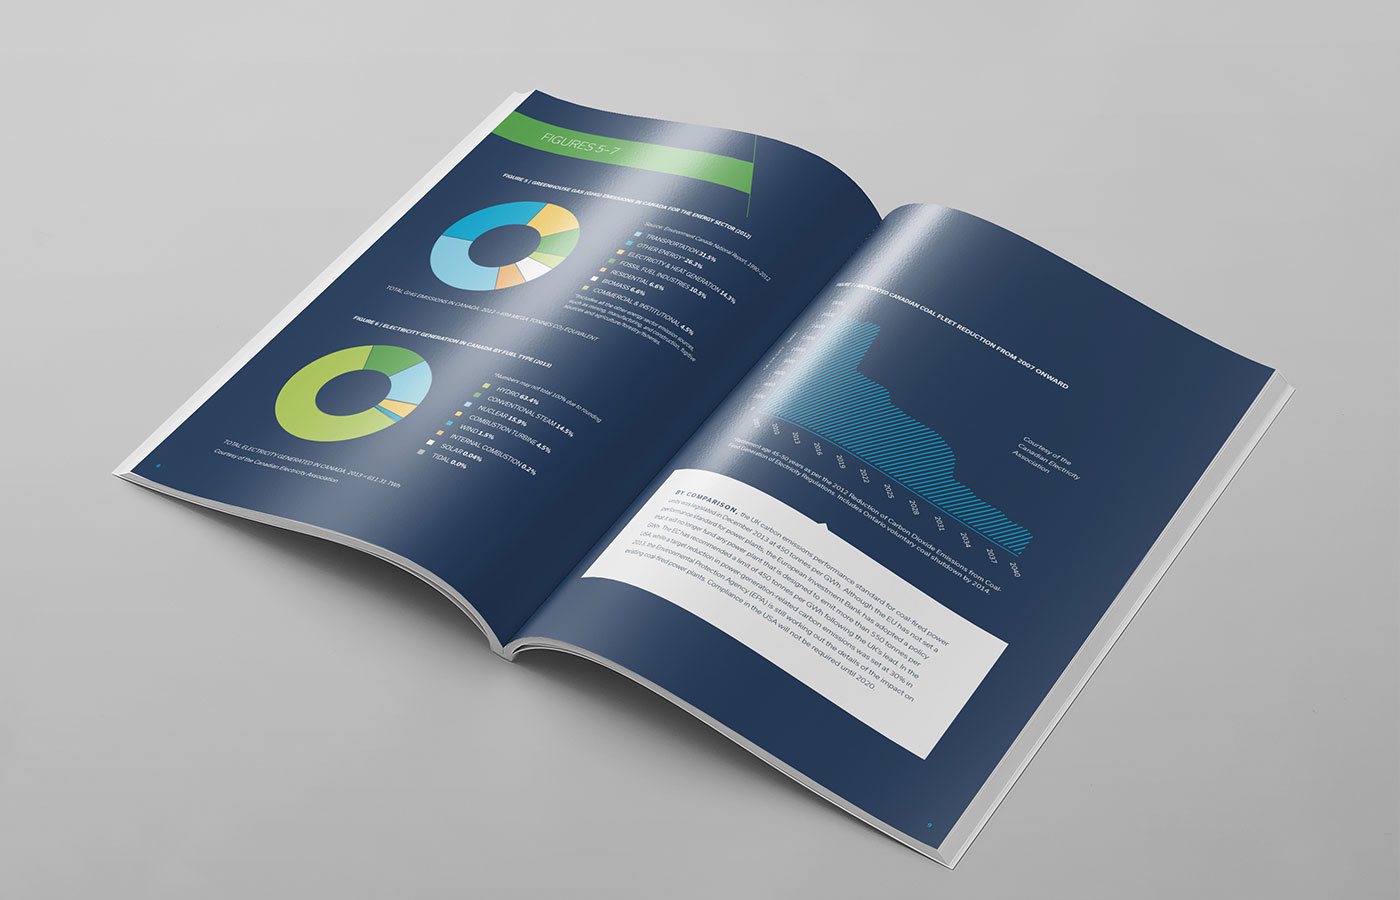 covetdesign_logo-design_branding_brochure-design_graphic-designer_vancouver_print_saskpower6